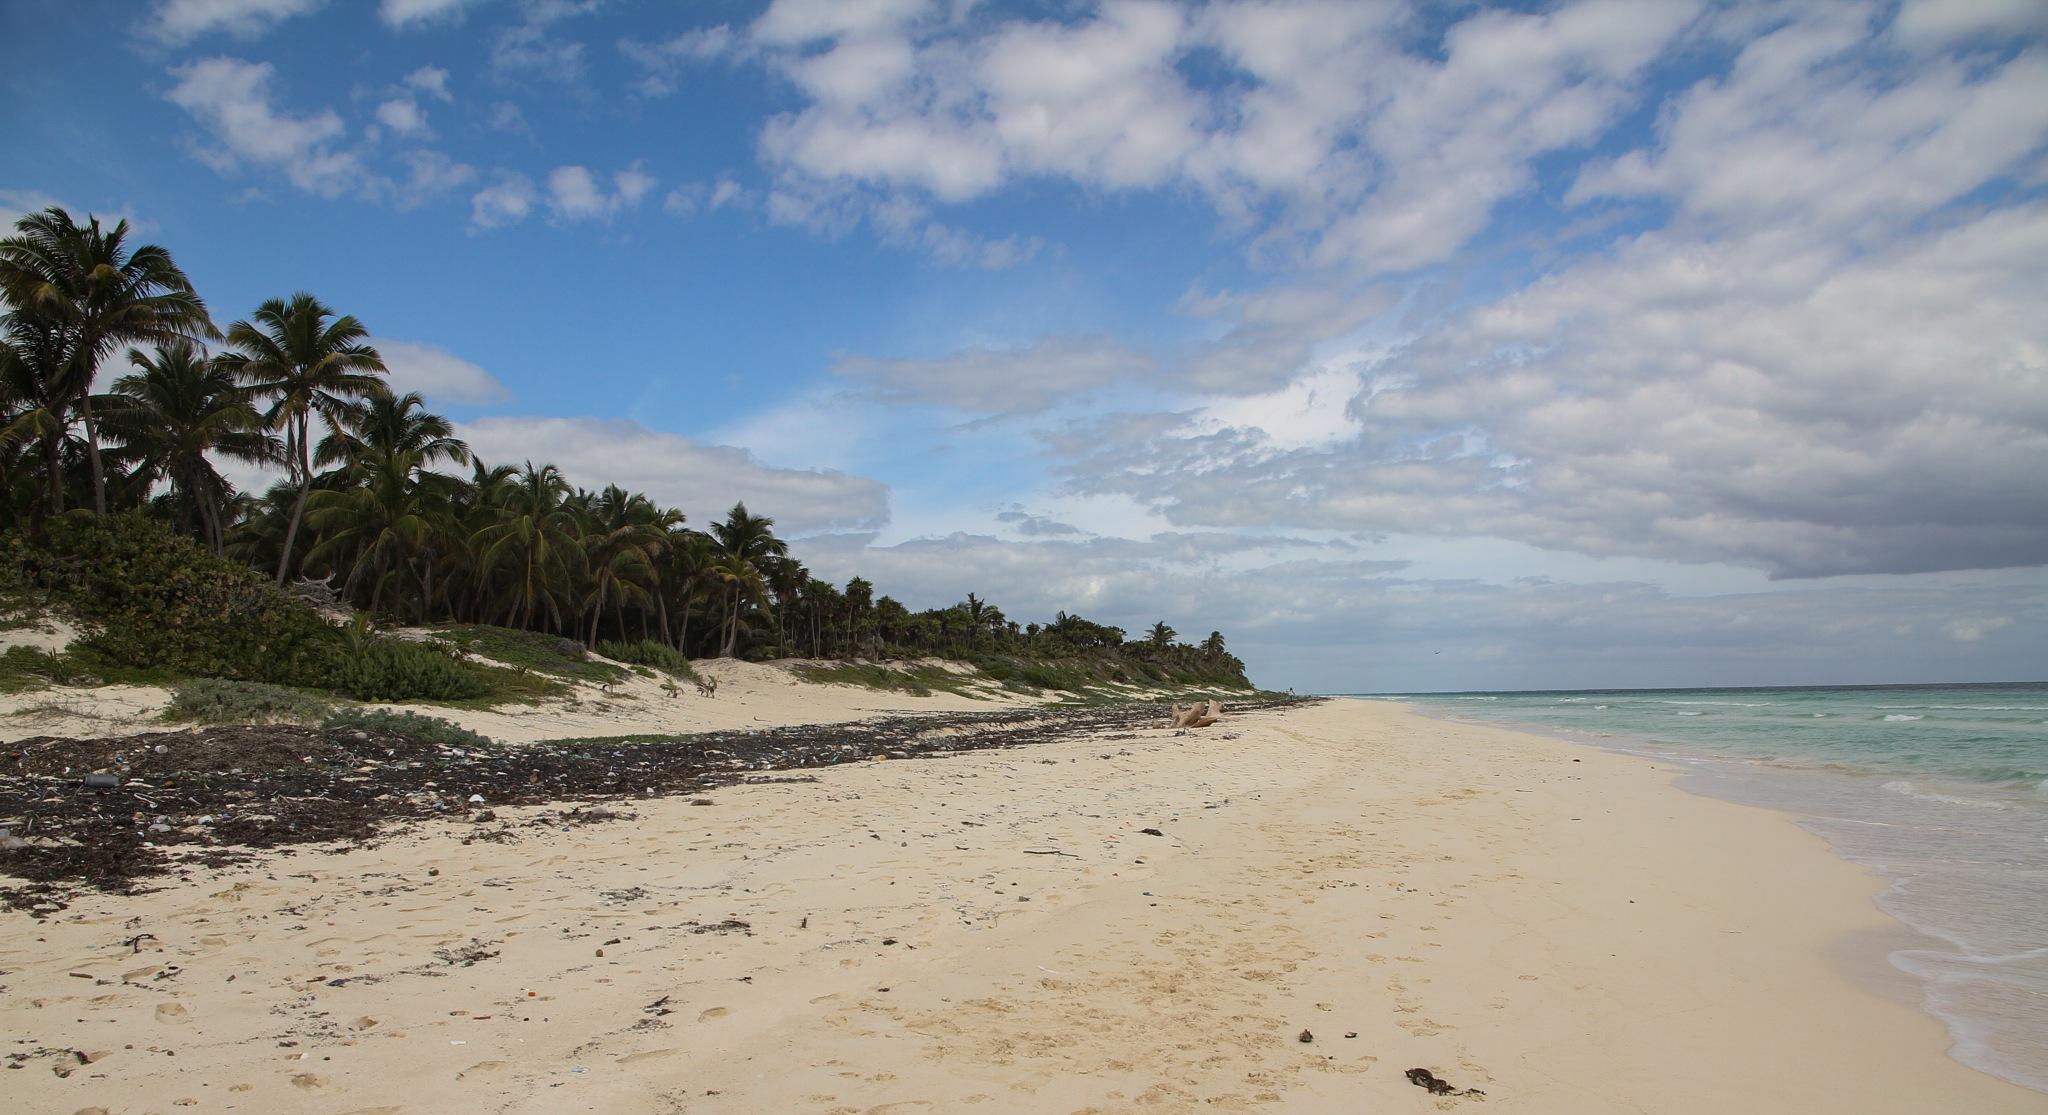 Beach Front by ZBir